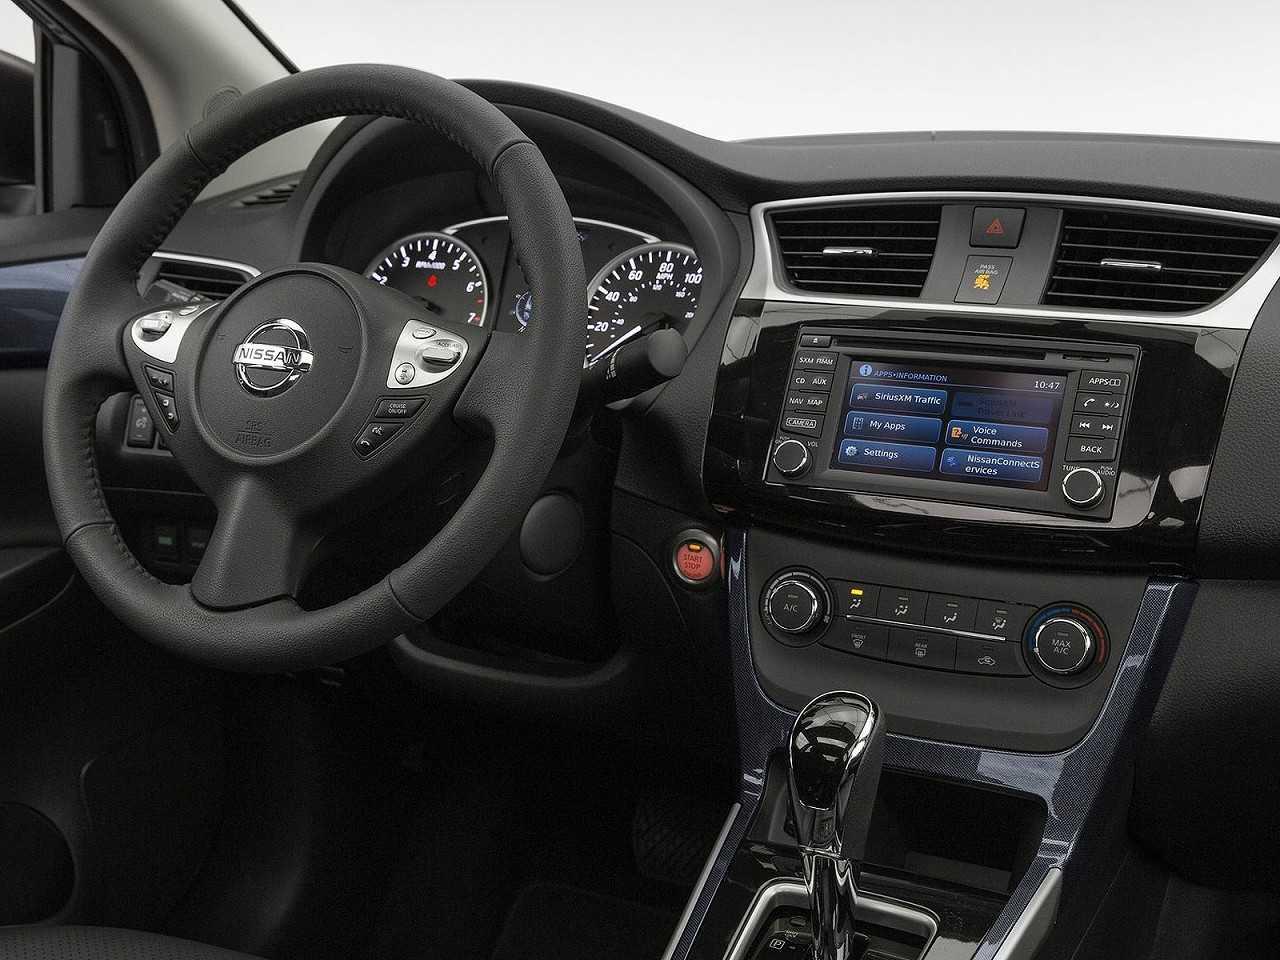 NissanSentra 2017 - painel